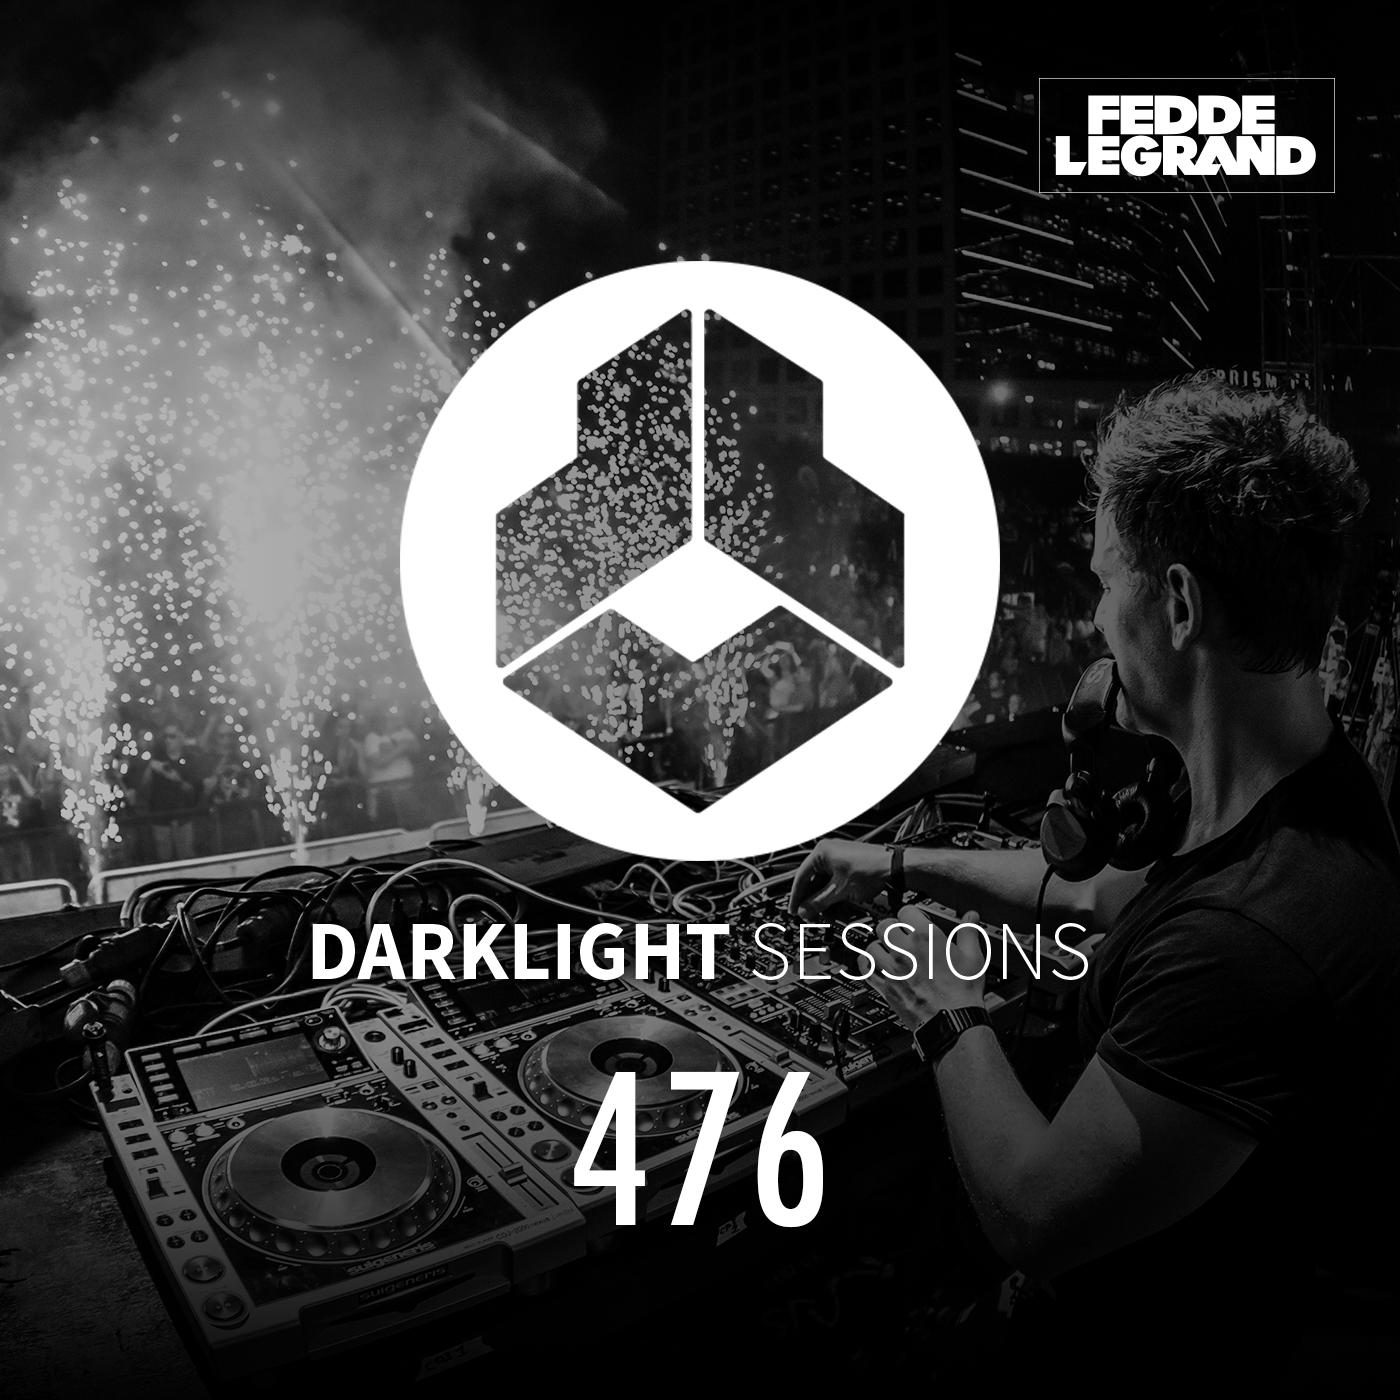 Darklight Sessions 476